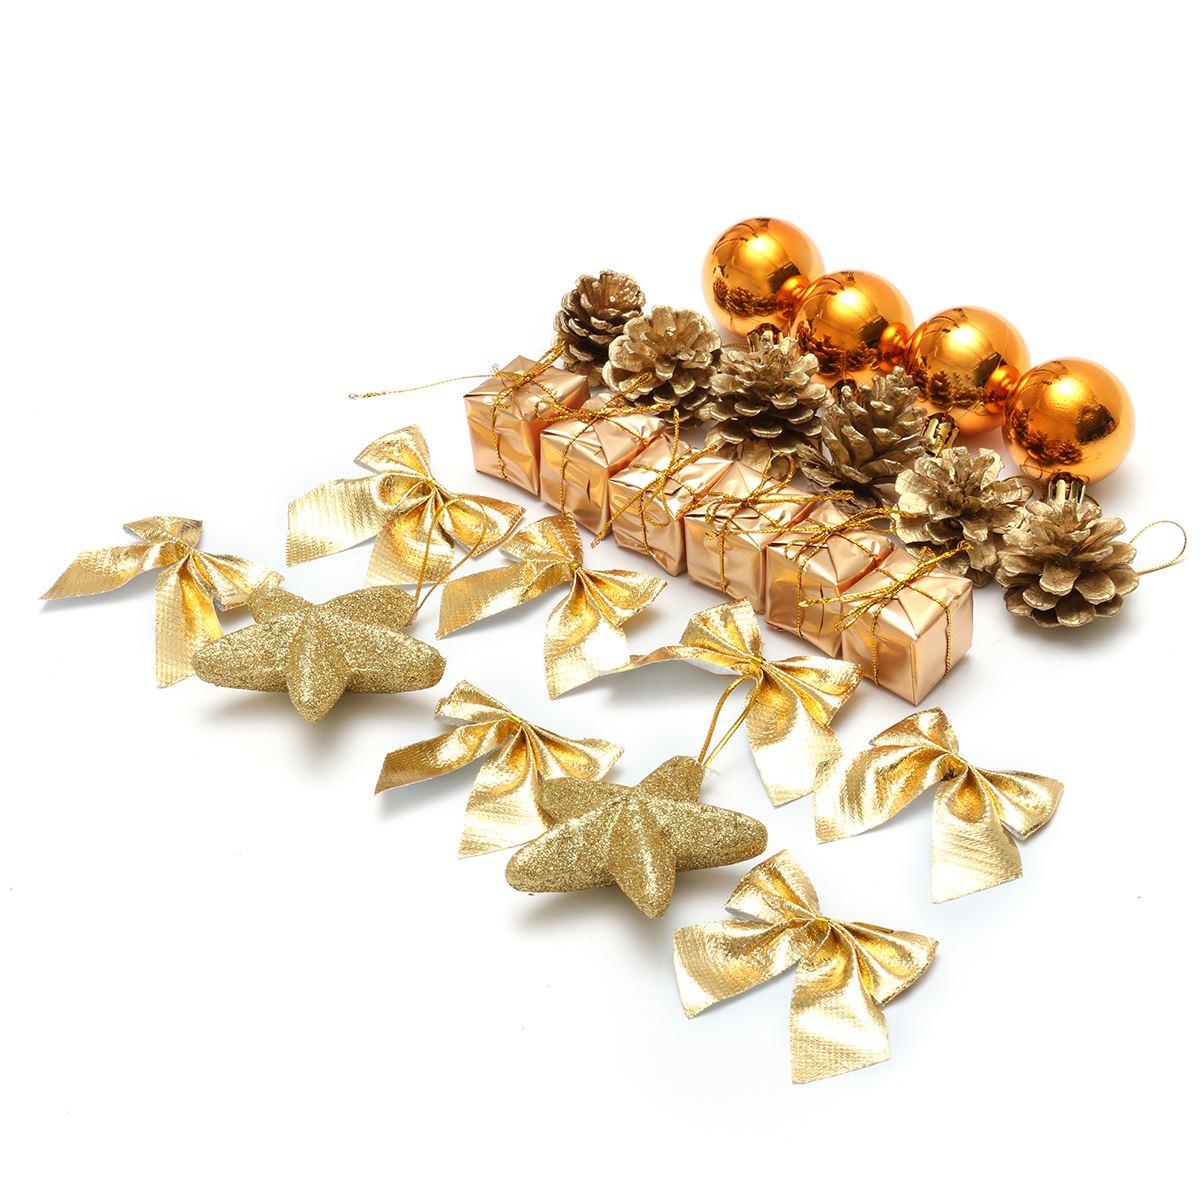 24 pcs/Pack Christmas Ornament Mini Gift Box Stars Ball Pinecone Baubles Christmas Tree Pendant Xmas Ornaments Decorations(China (Mainland))